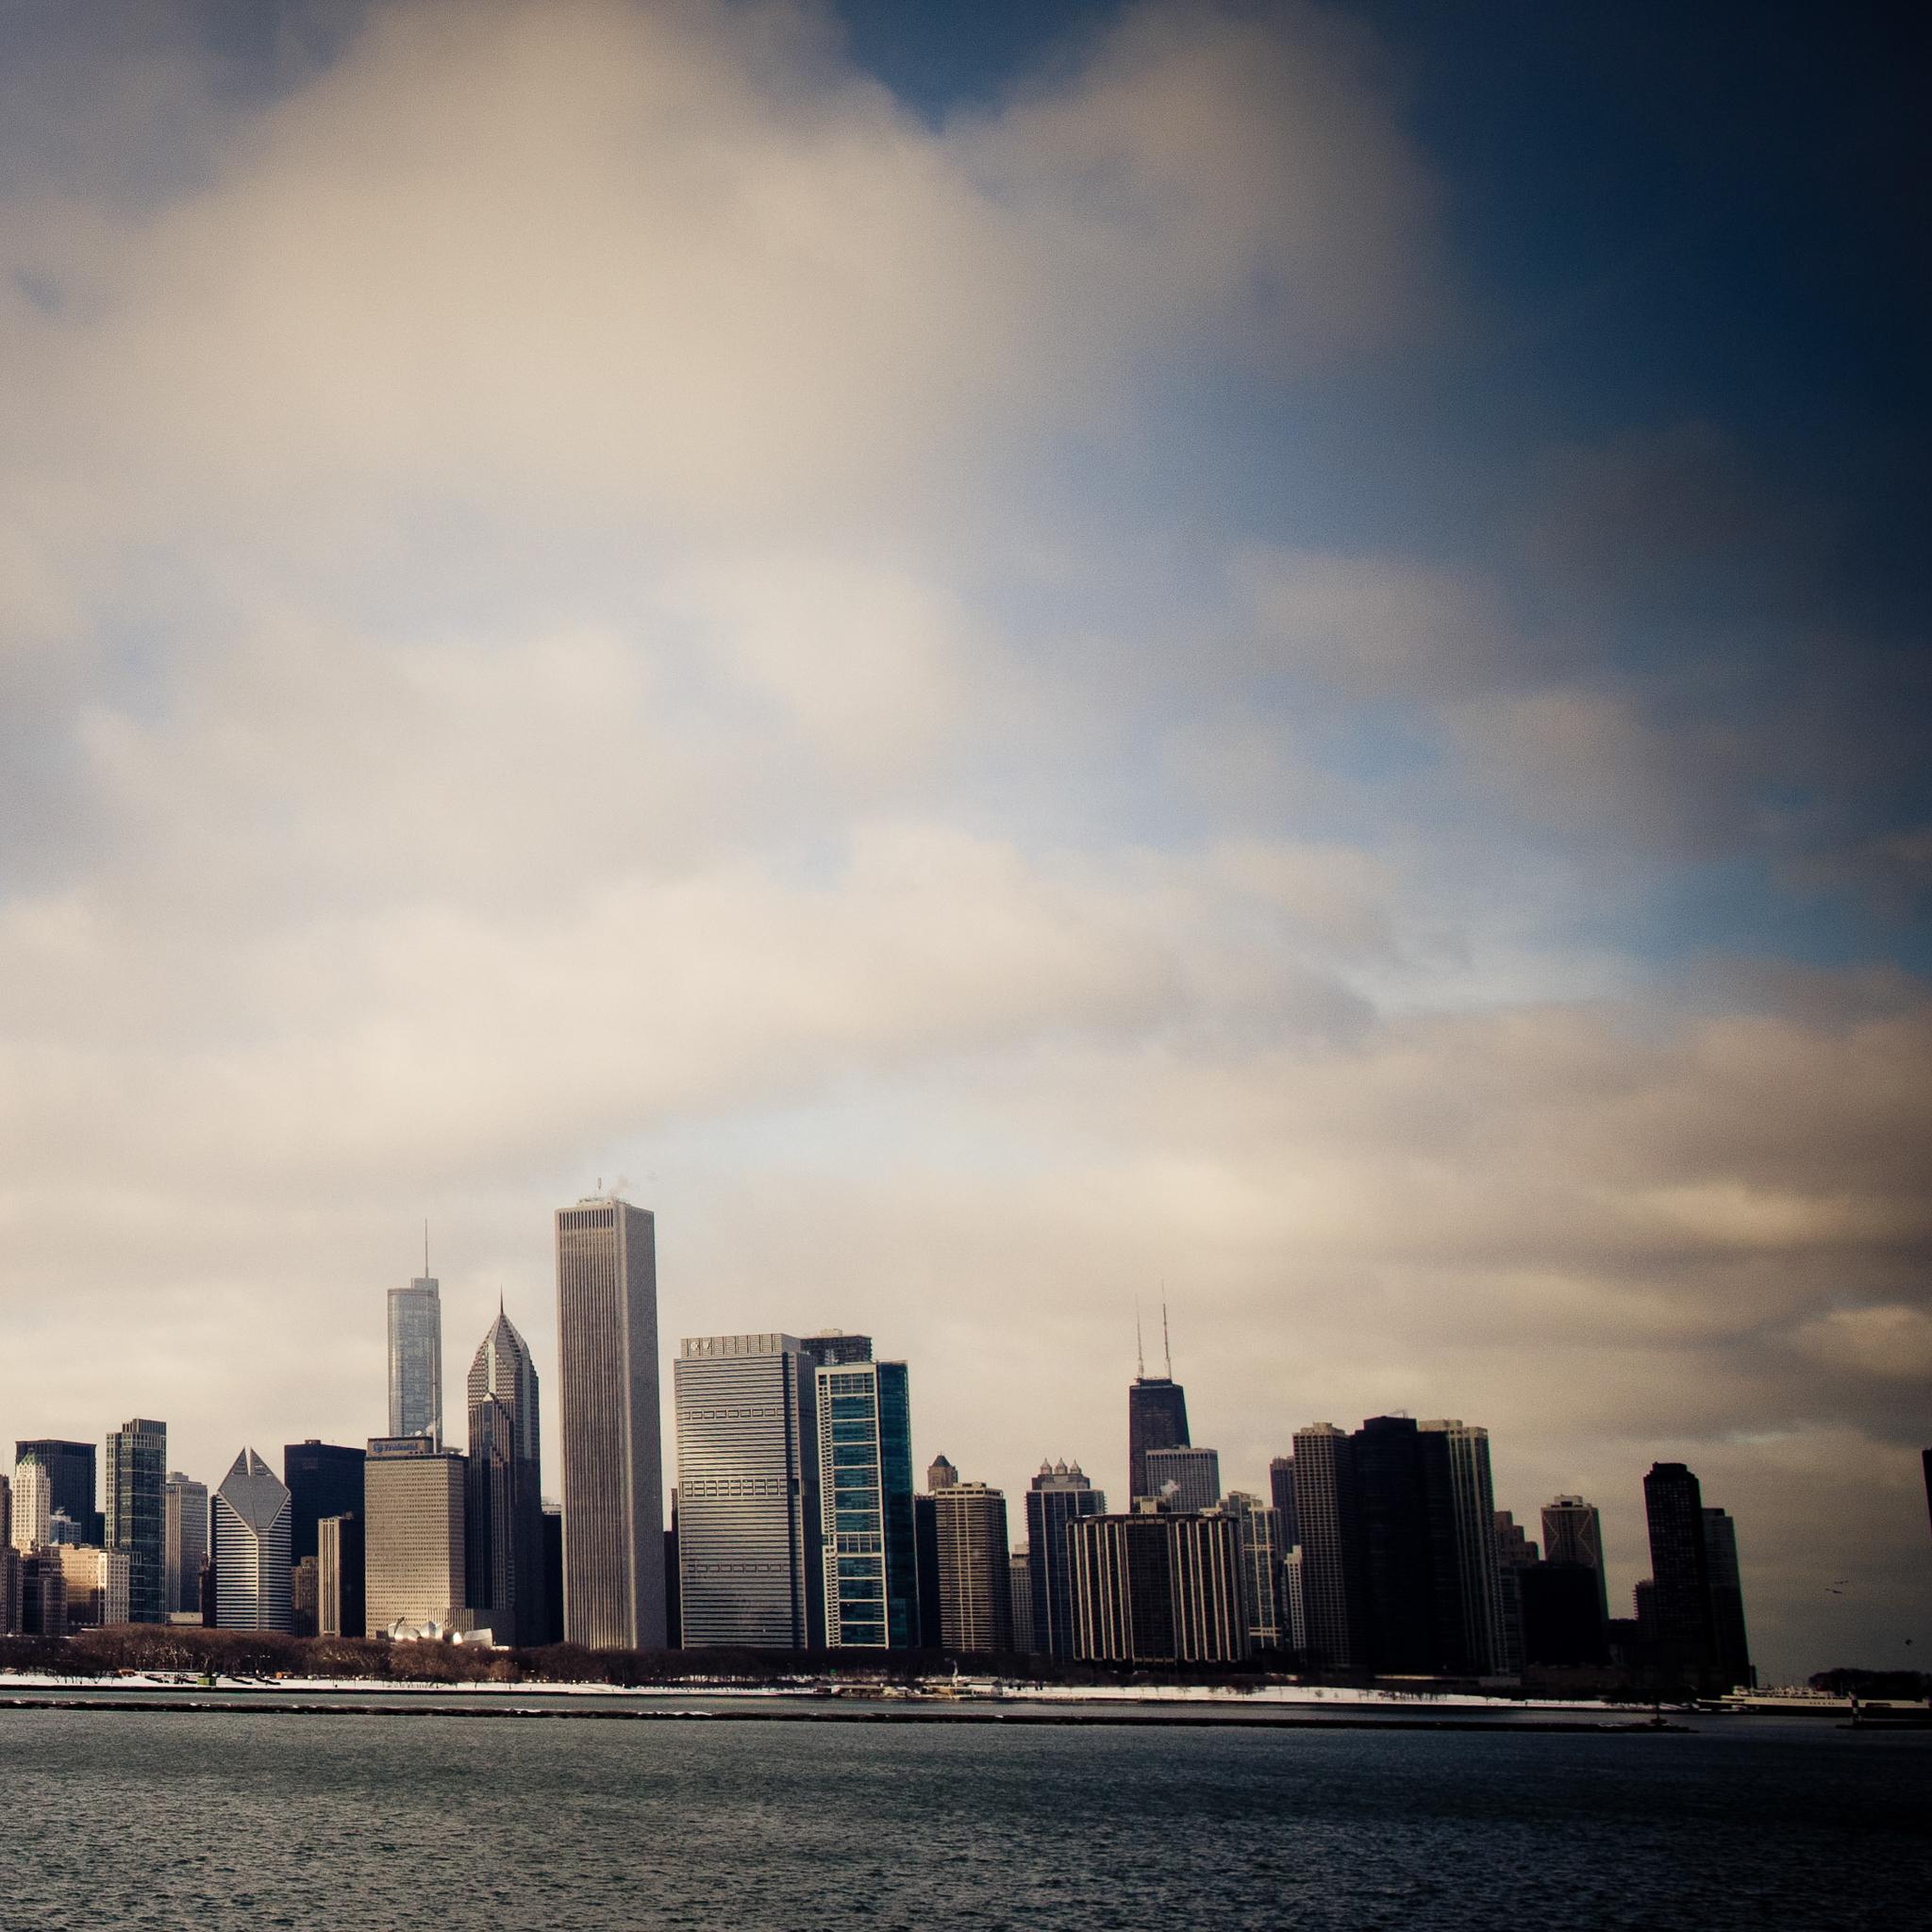 009_chicago_skyline.jpg